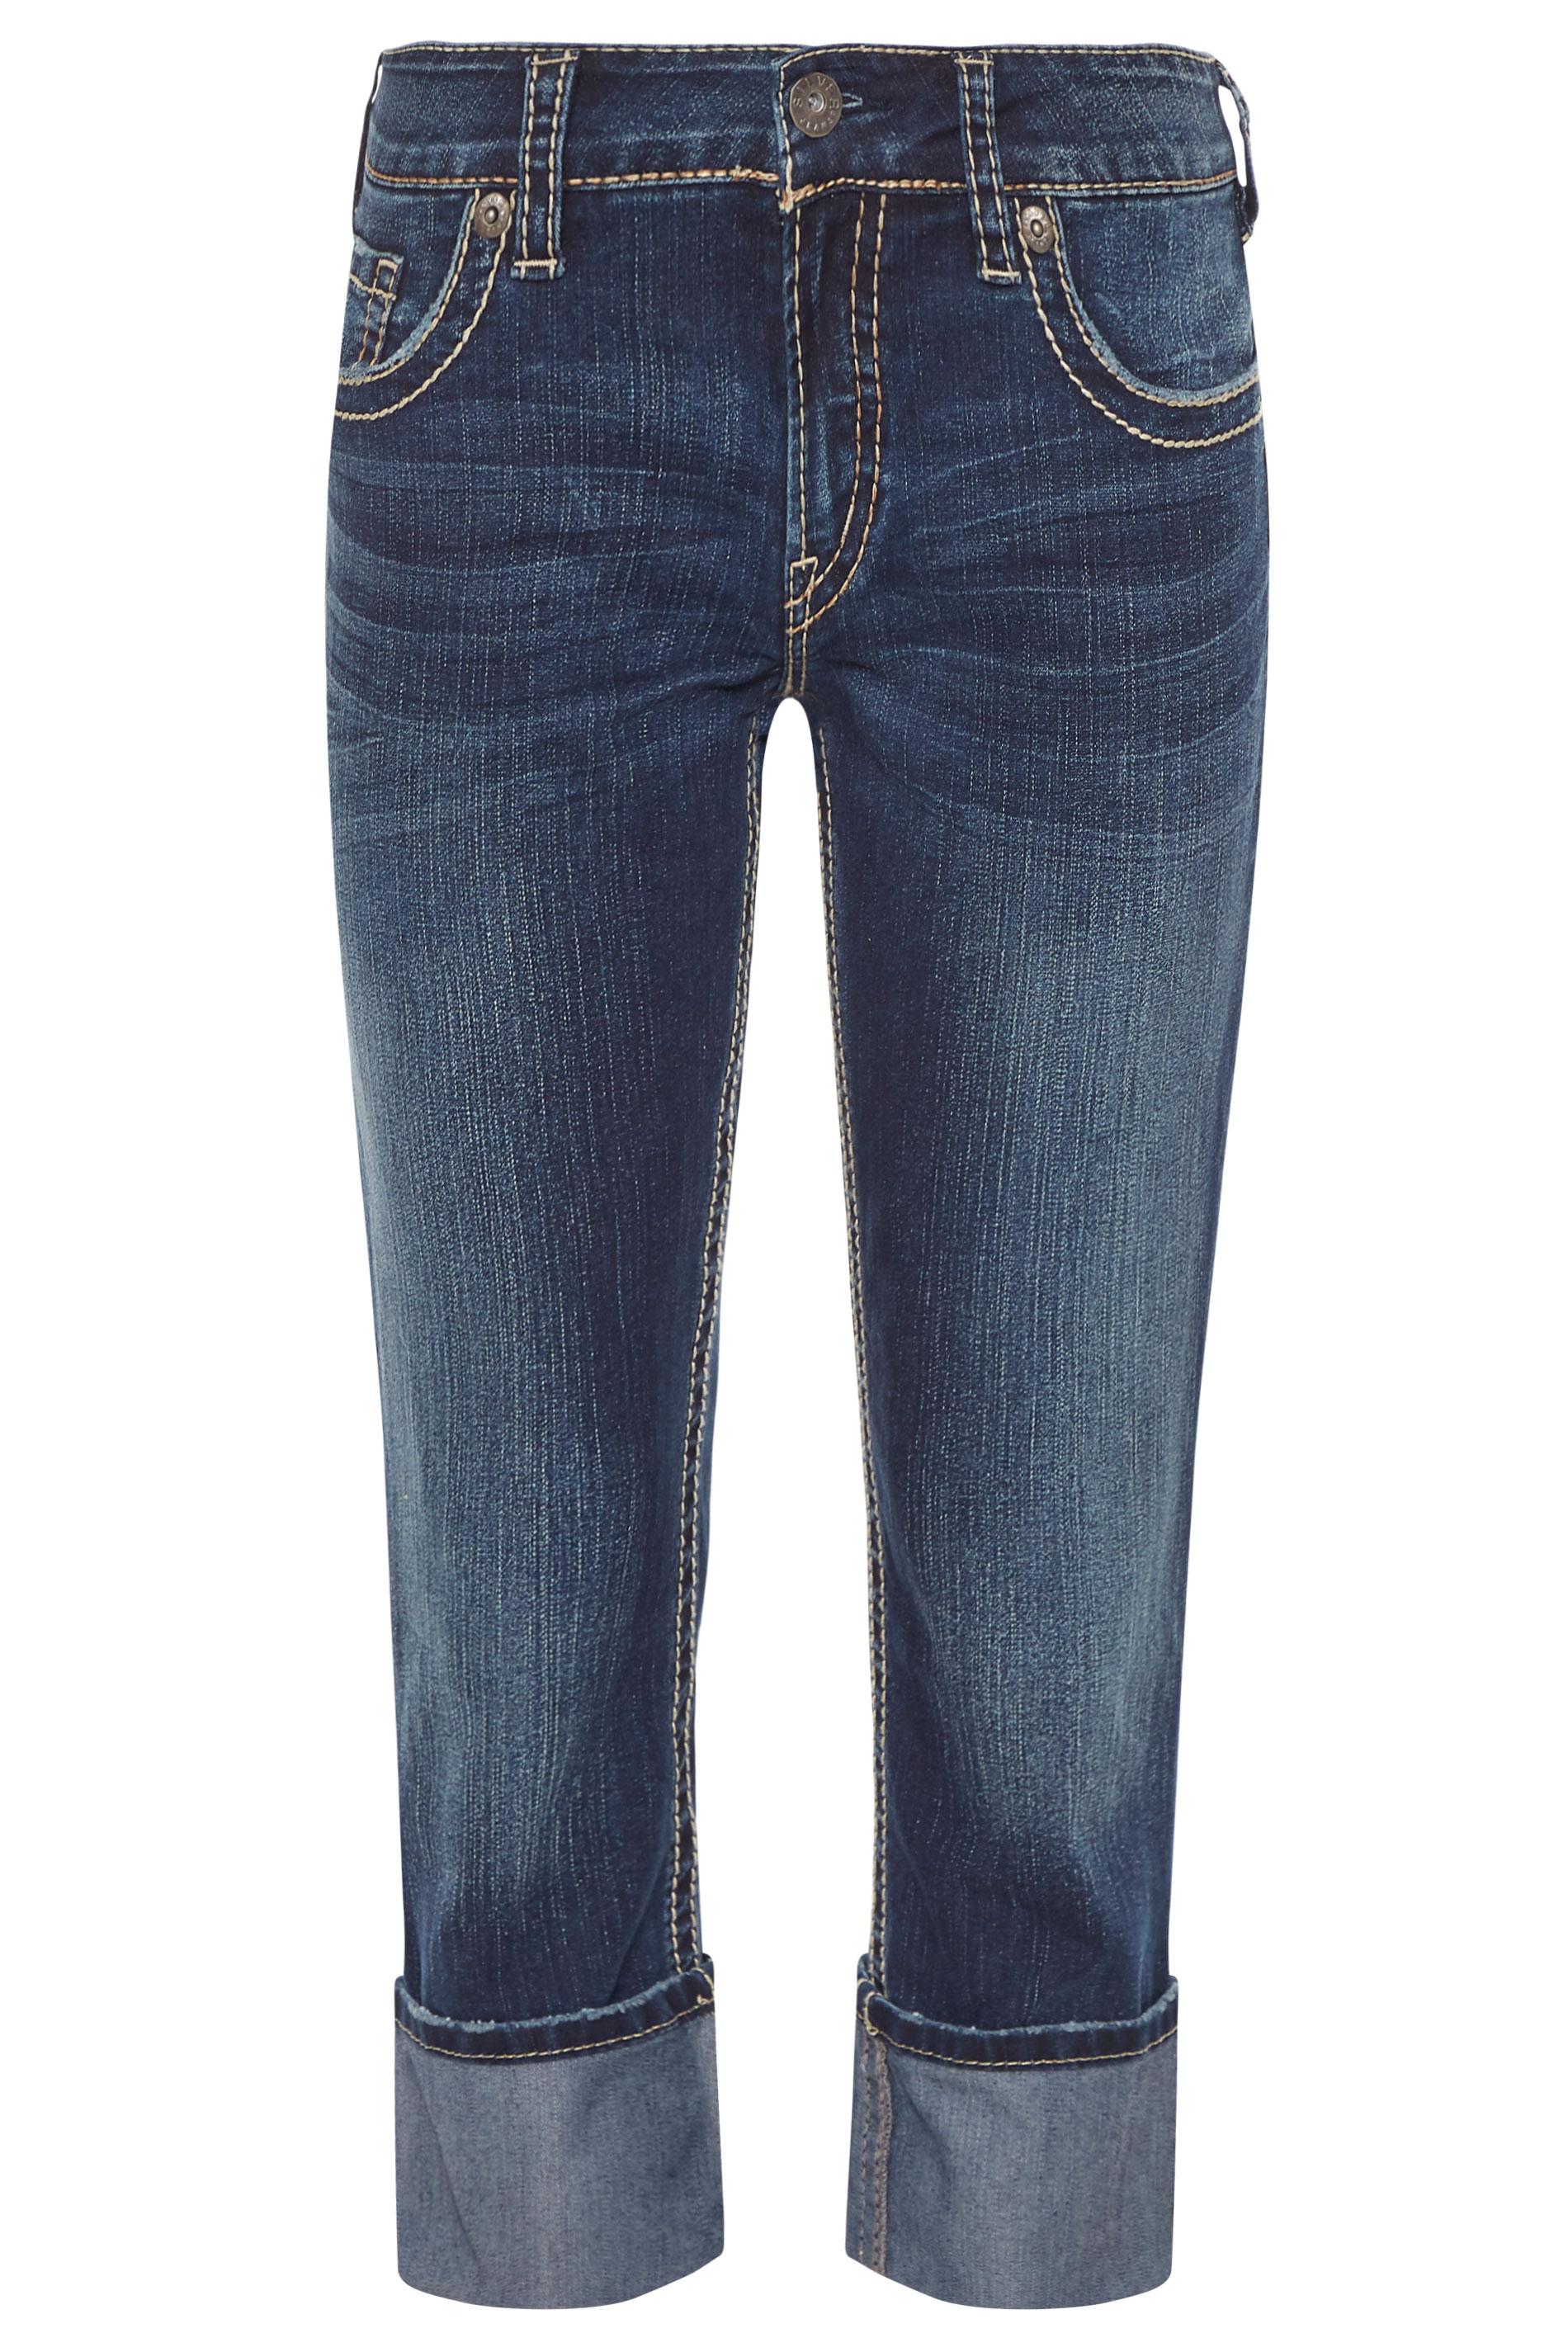 SILVER JEANS Blue Denim Suki Capri Jeans